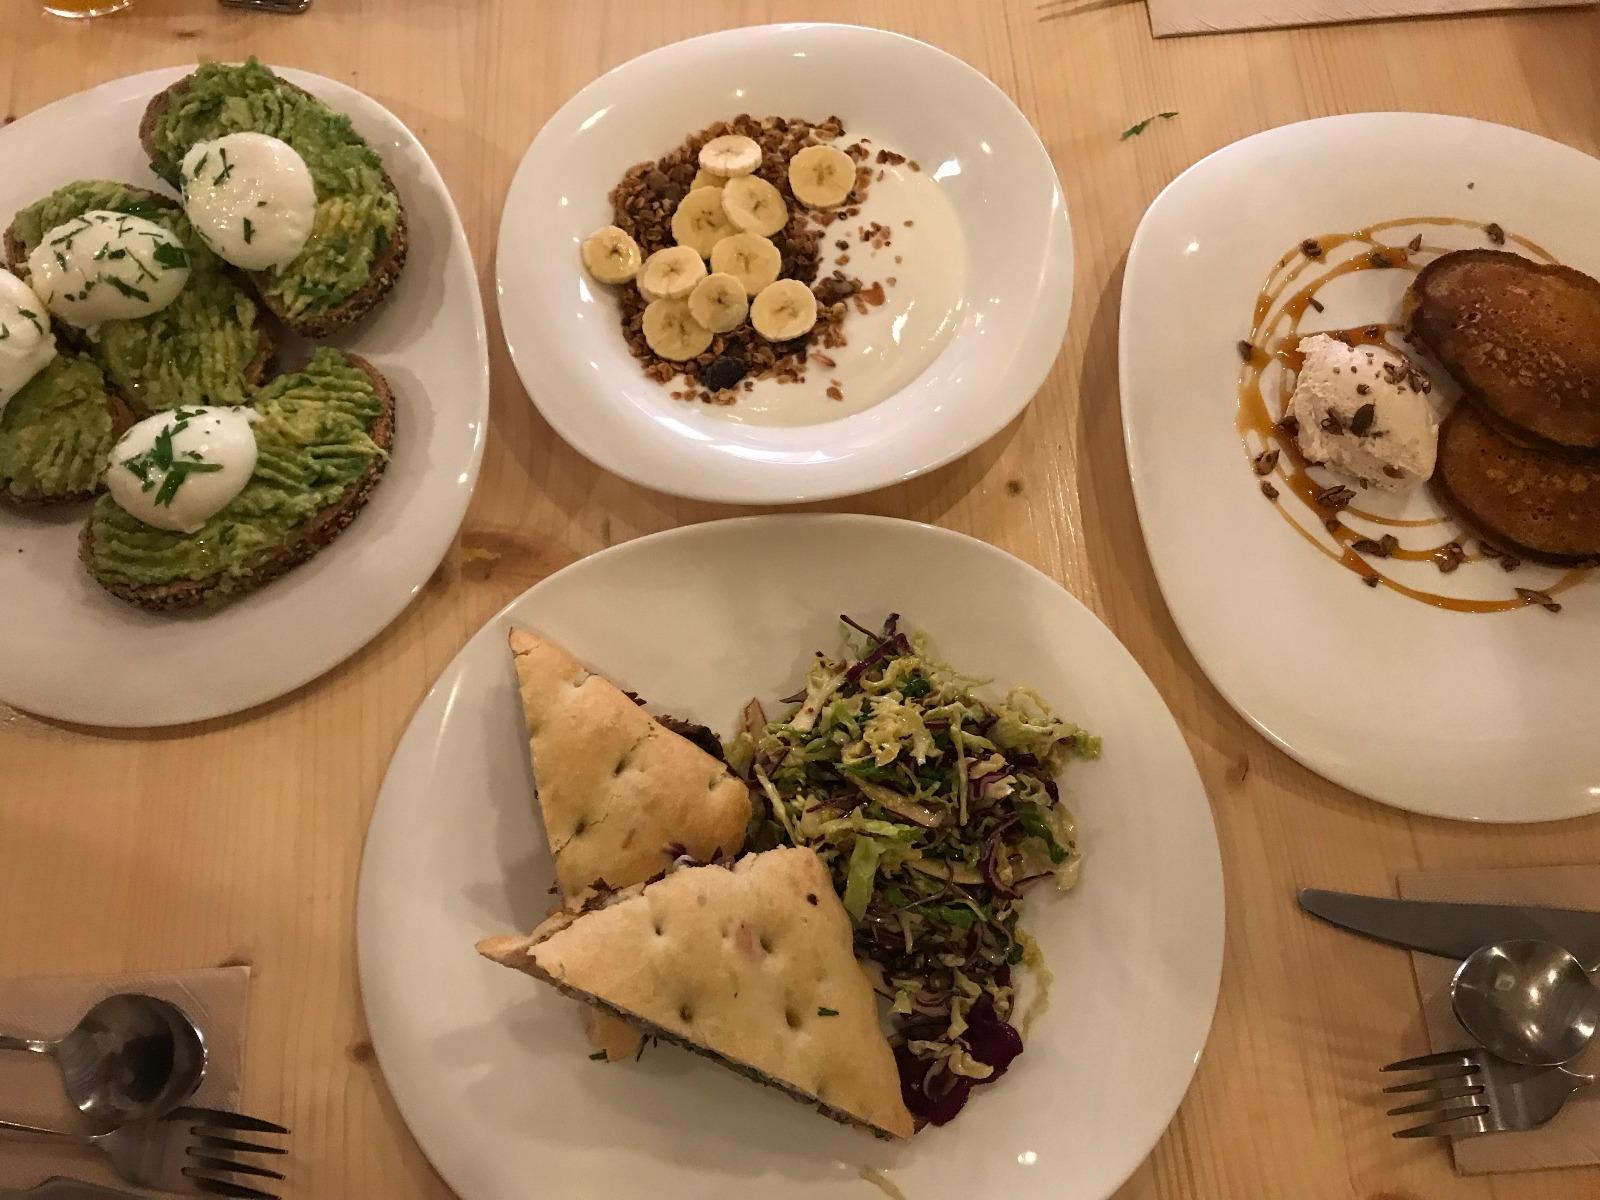 palma-mallorca-bonnes-adresses-brunch-santosha-plats